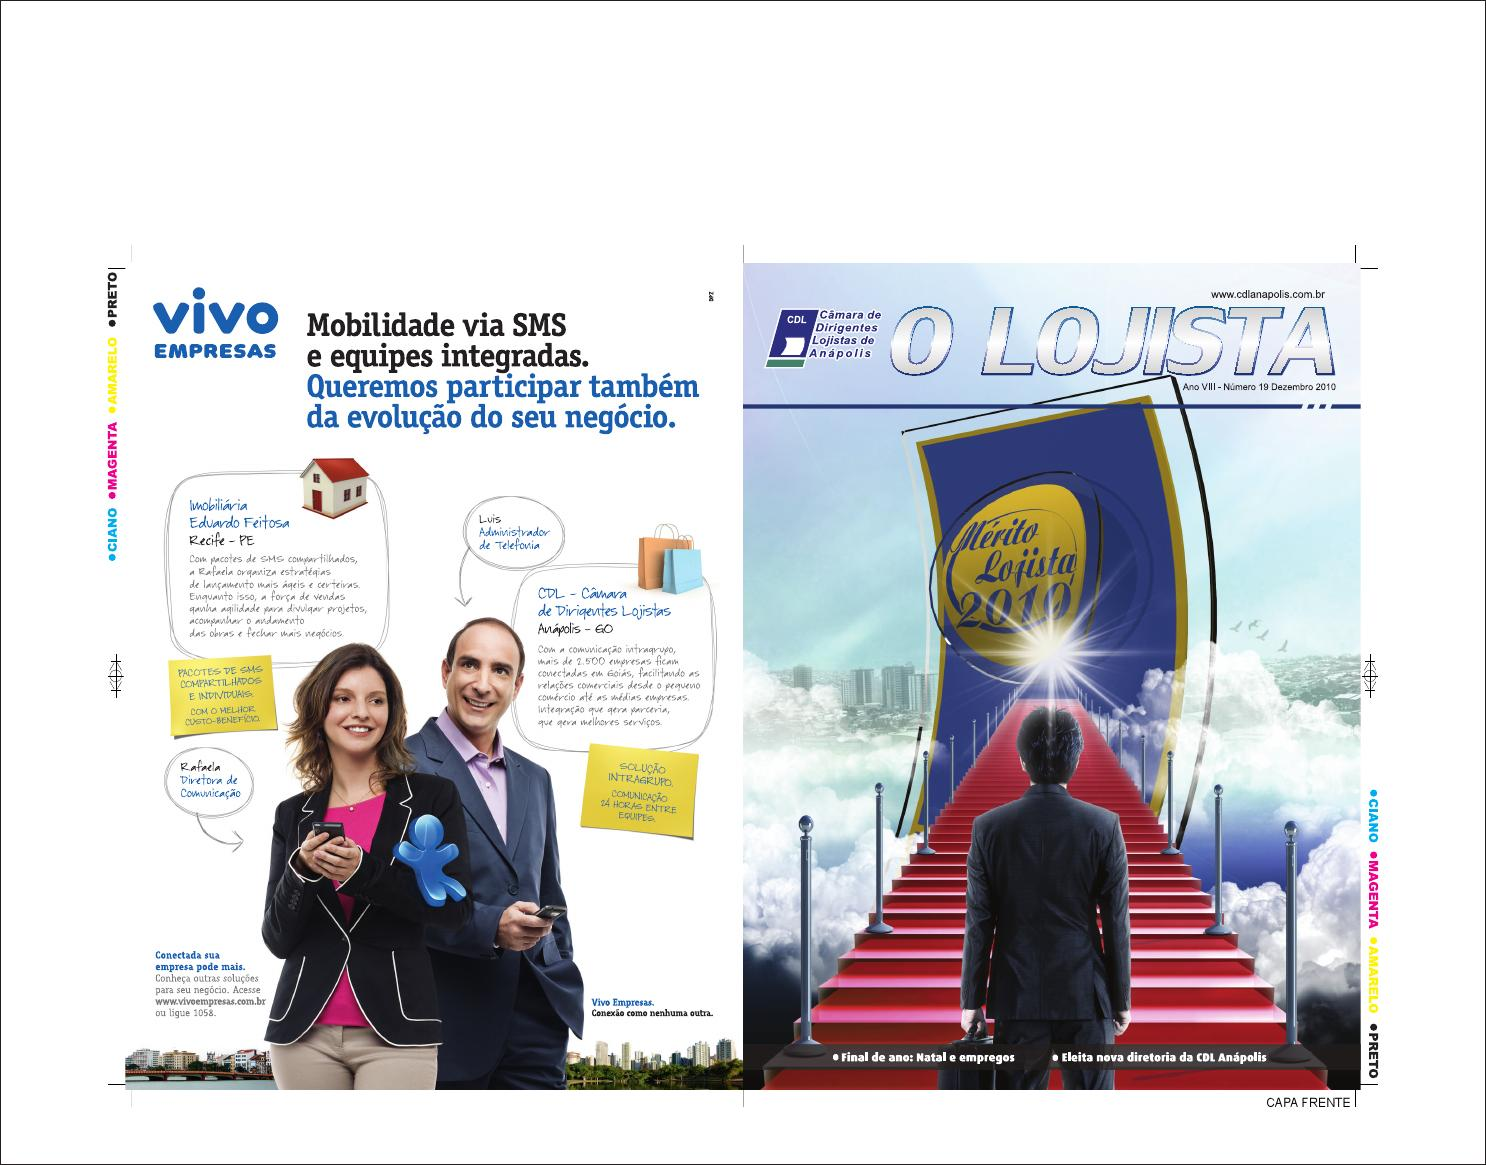 Revista O LOJISTA by CDL Anápolis - issuu 979337d5a6